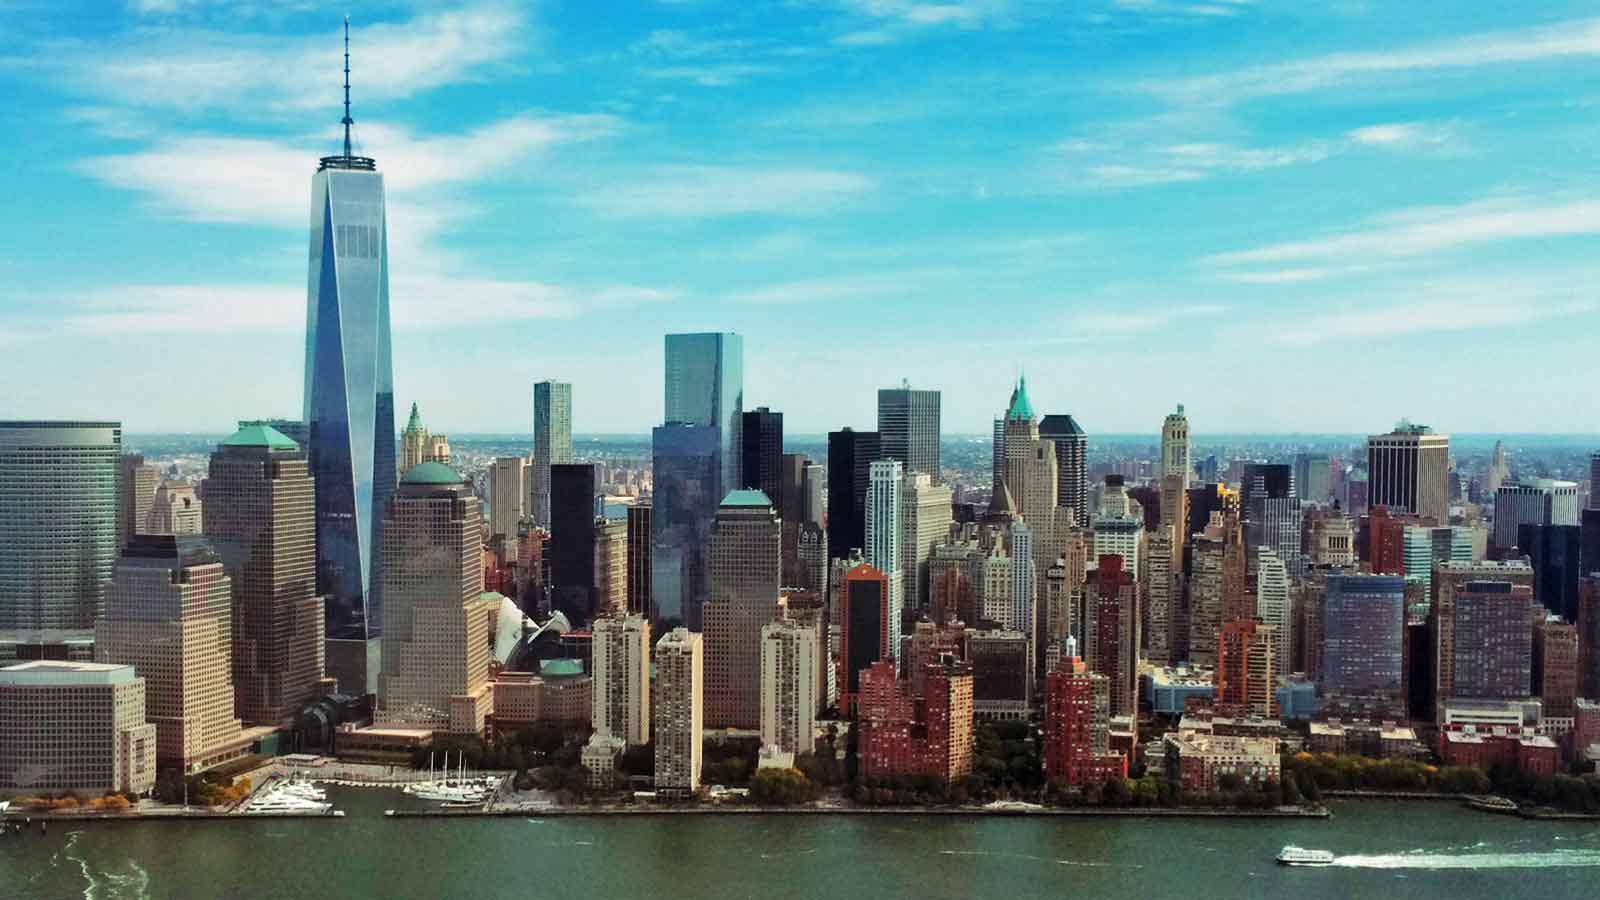 Flights from New York John F Kennedy (JFK) to San Francisco (SFO)